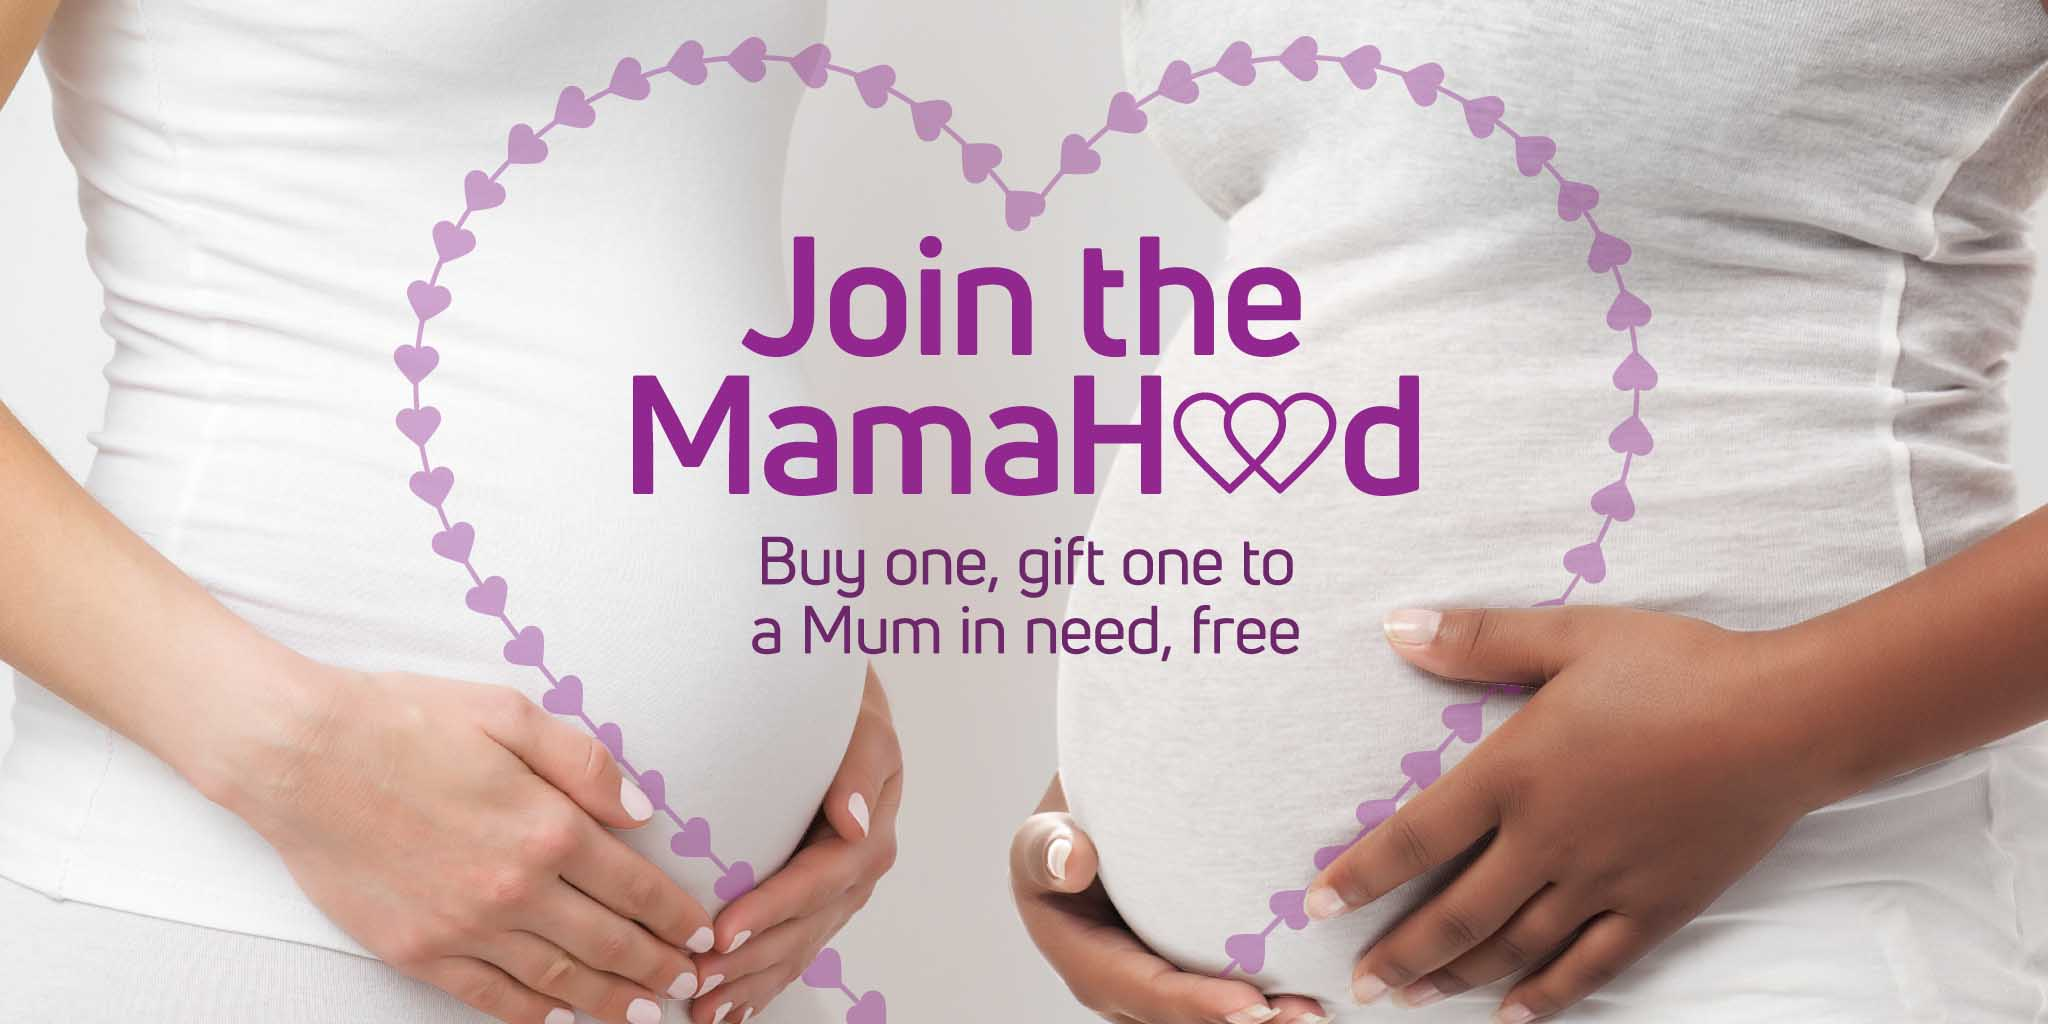 Join the Mamahood